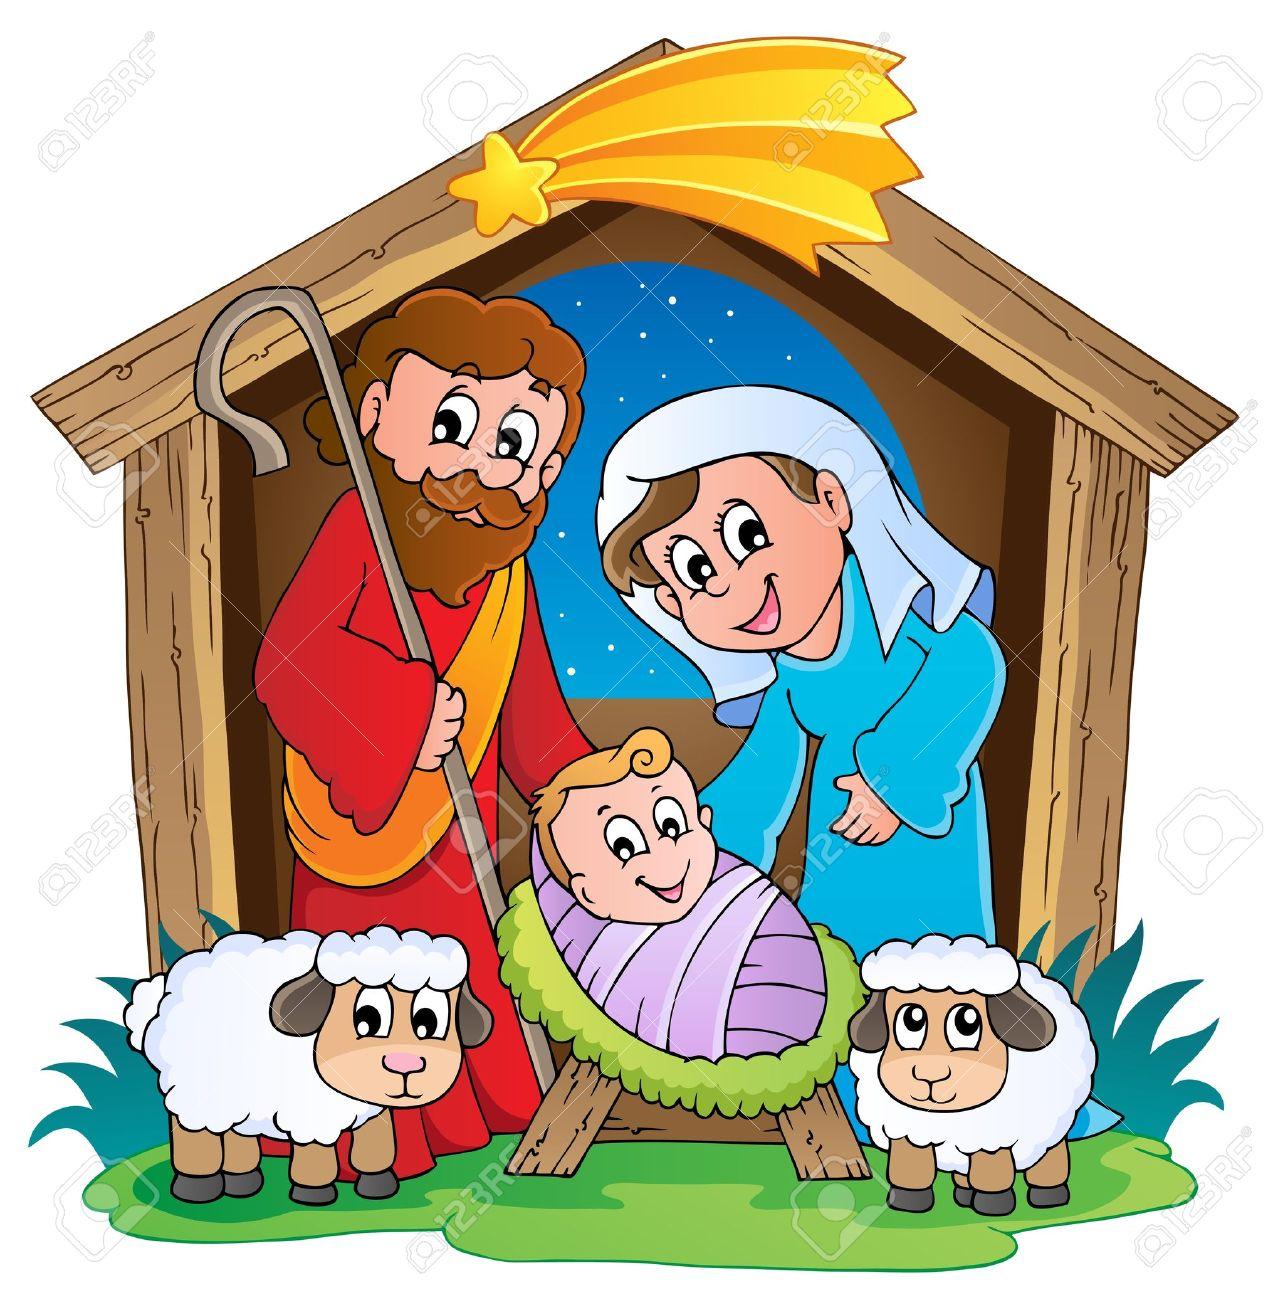 Christmas Nativity scene 2.